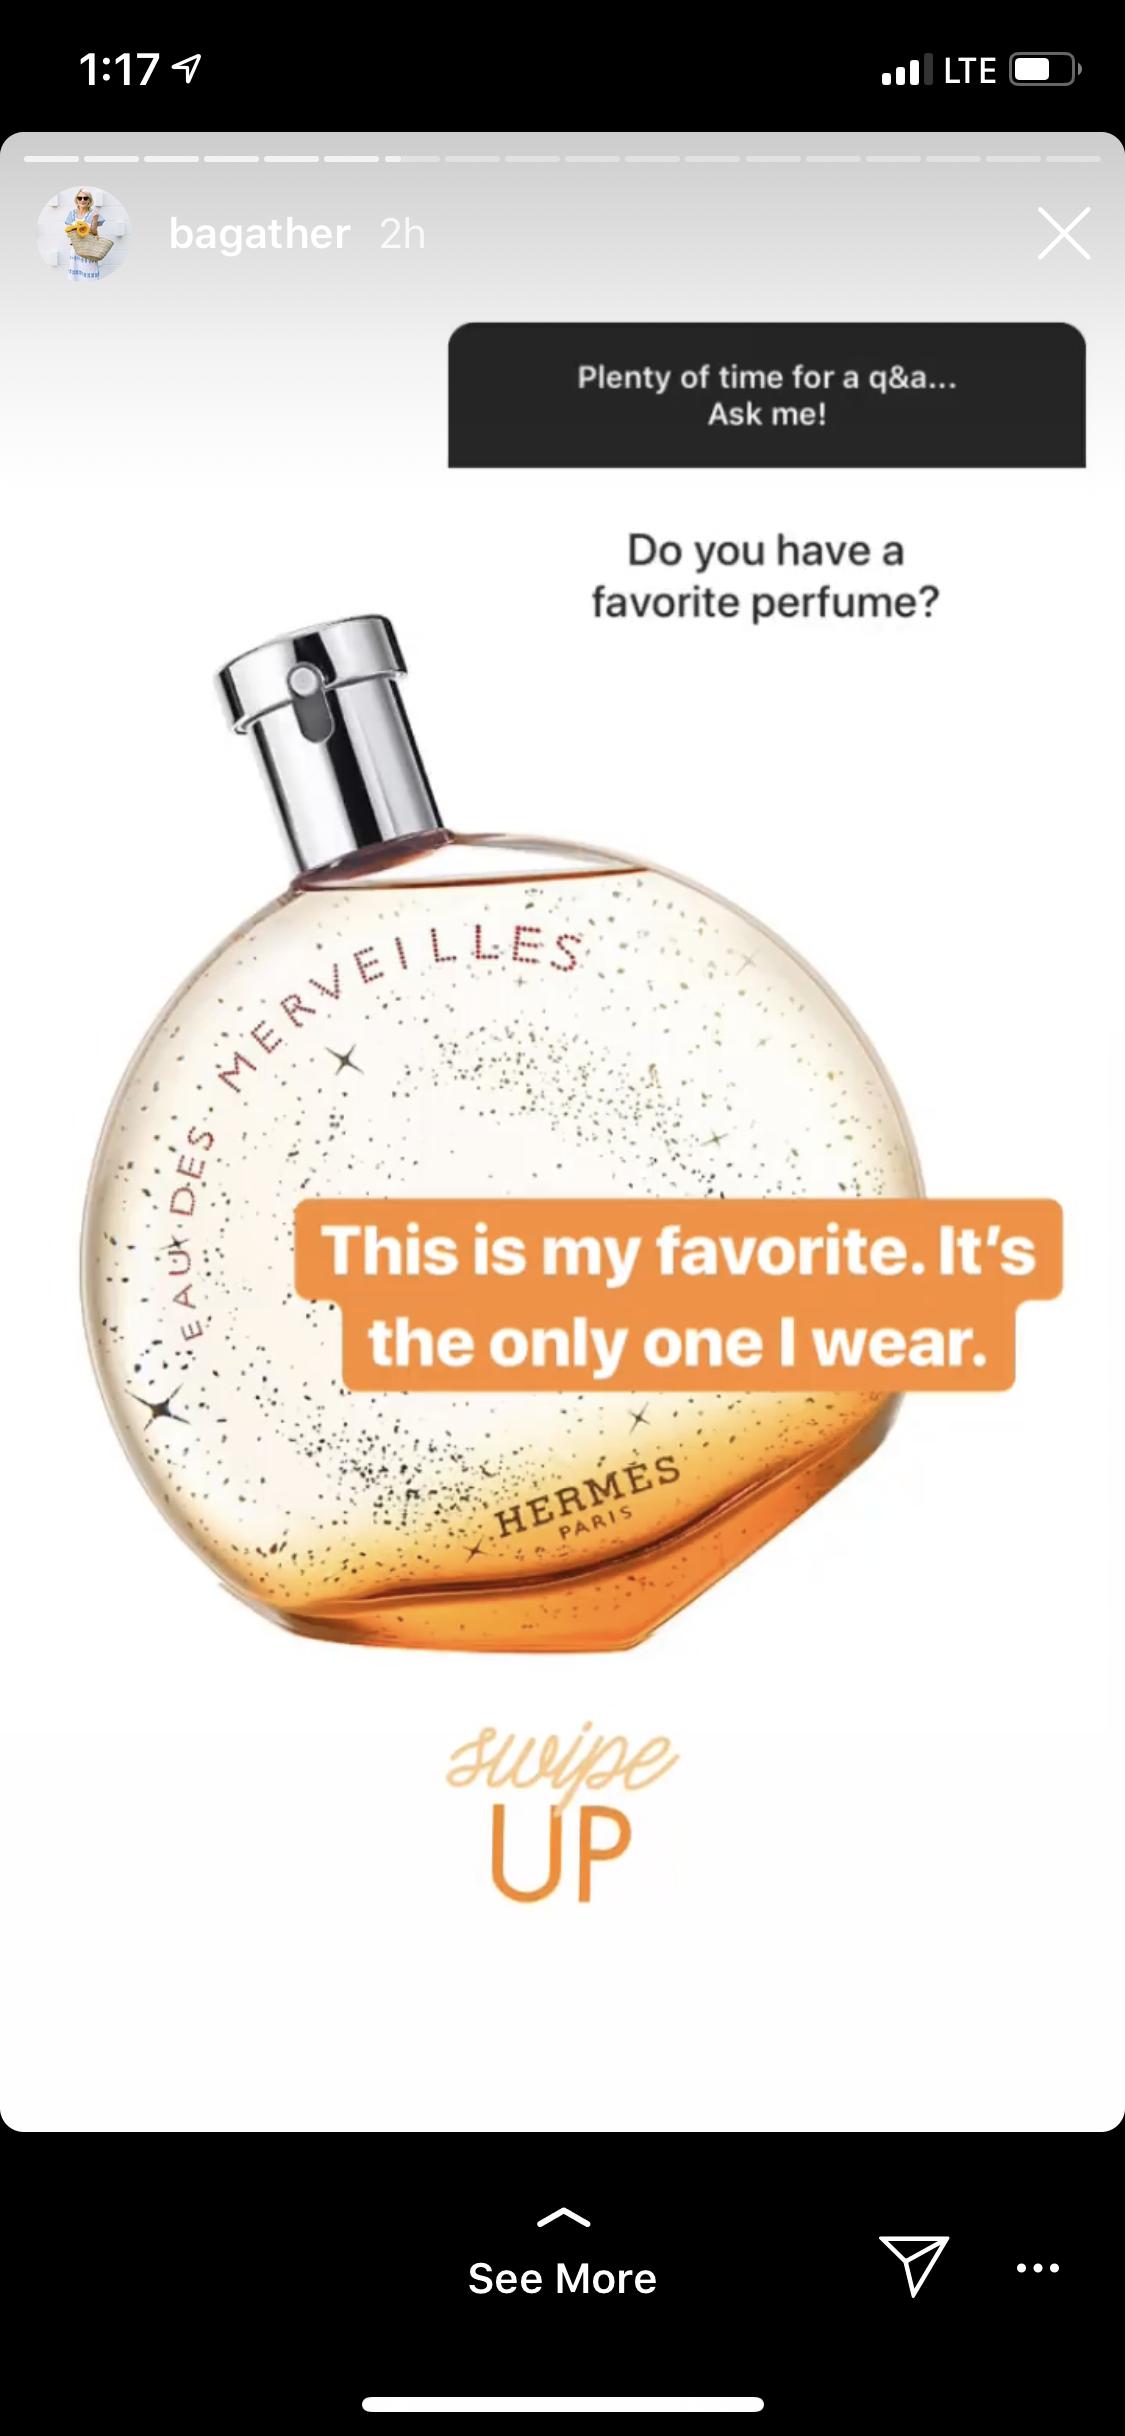 Pin by Haley Bunting on beauty Perfume, Flask, Barware